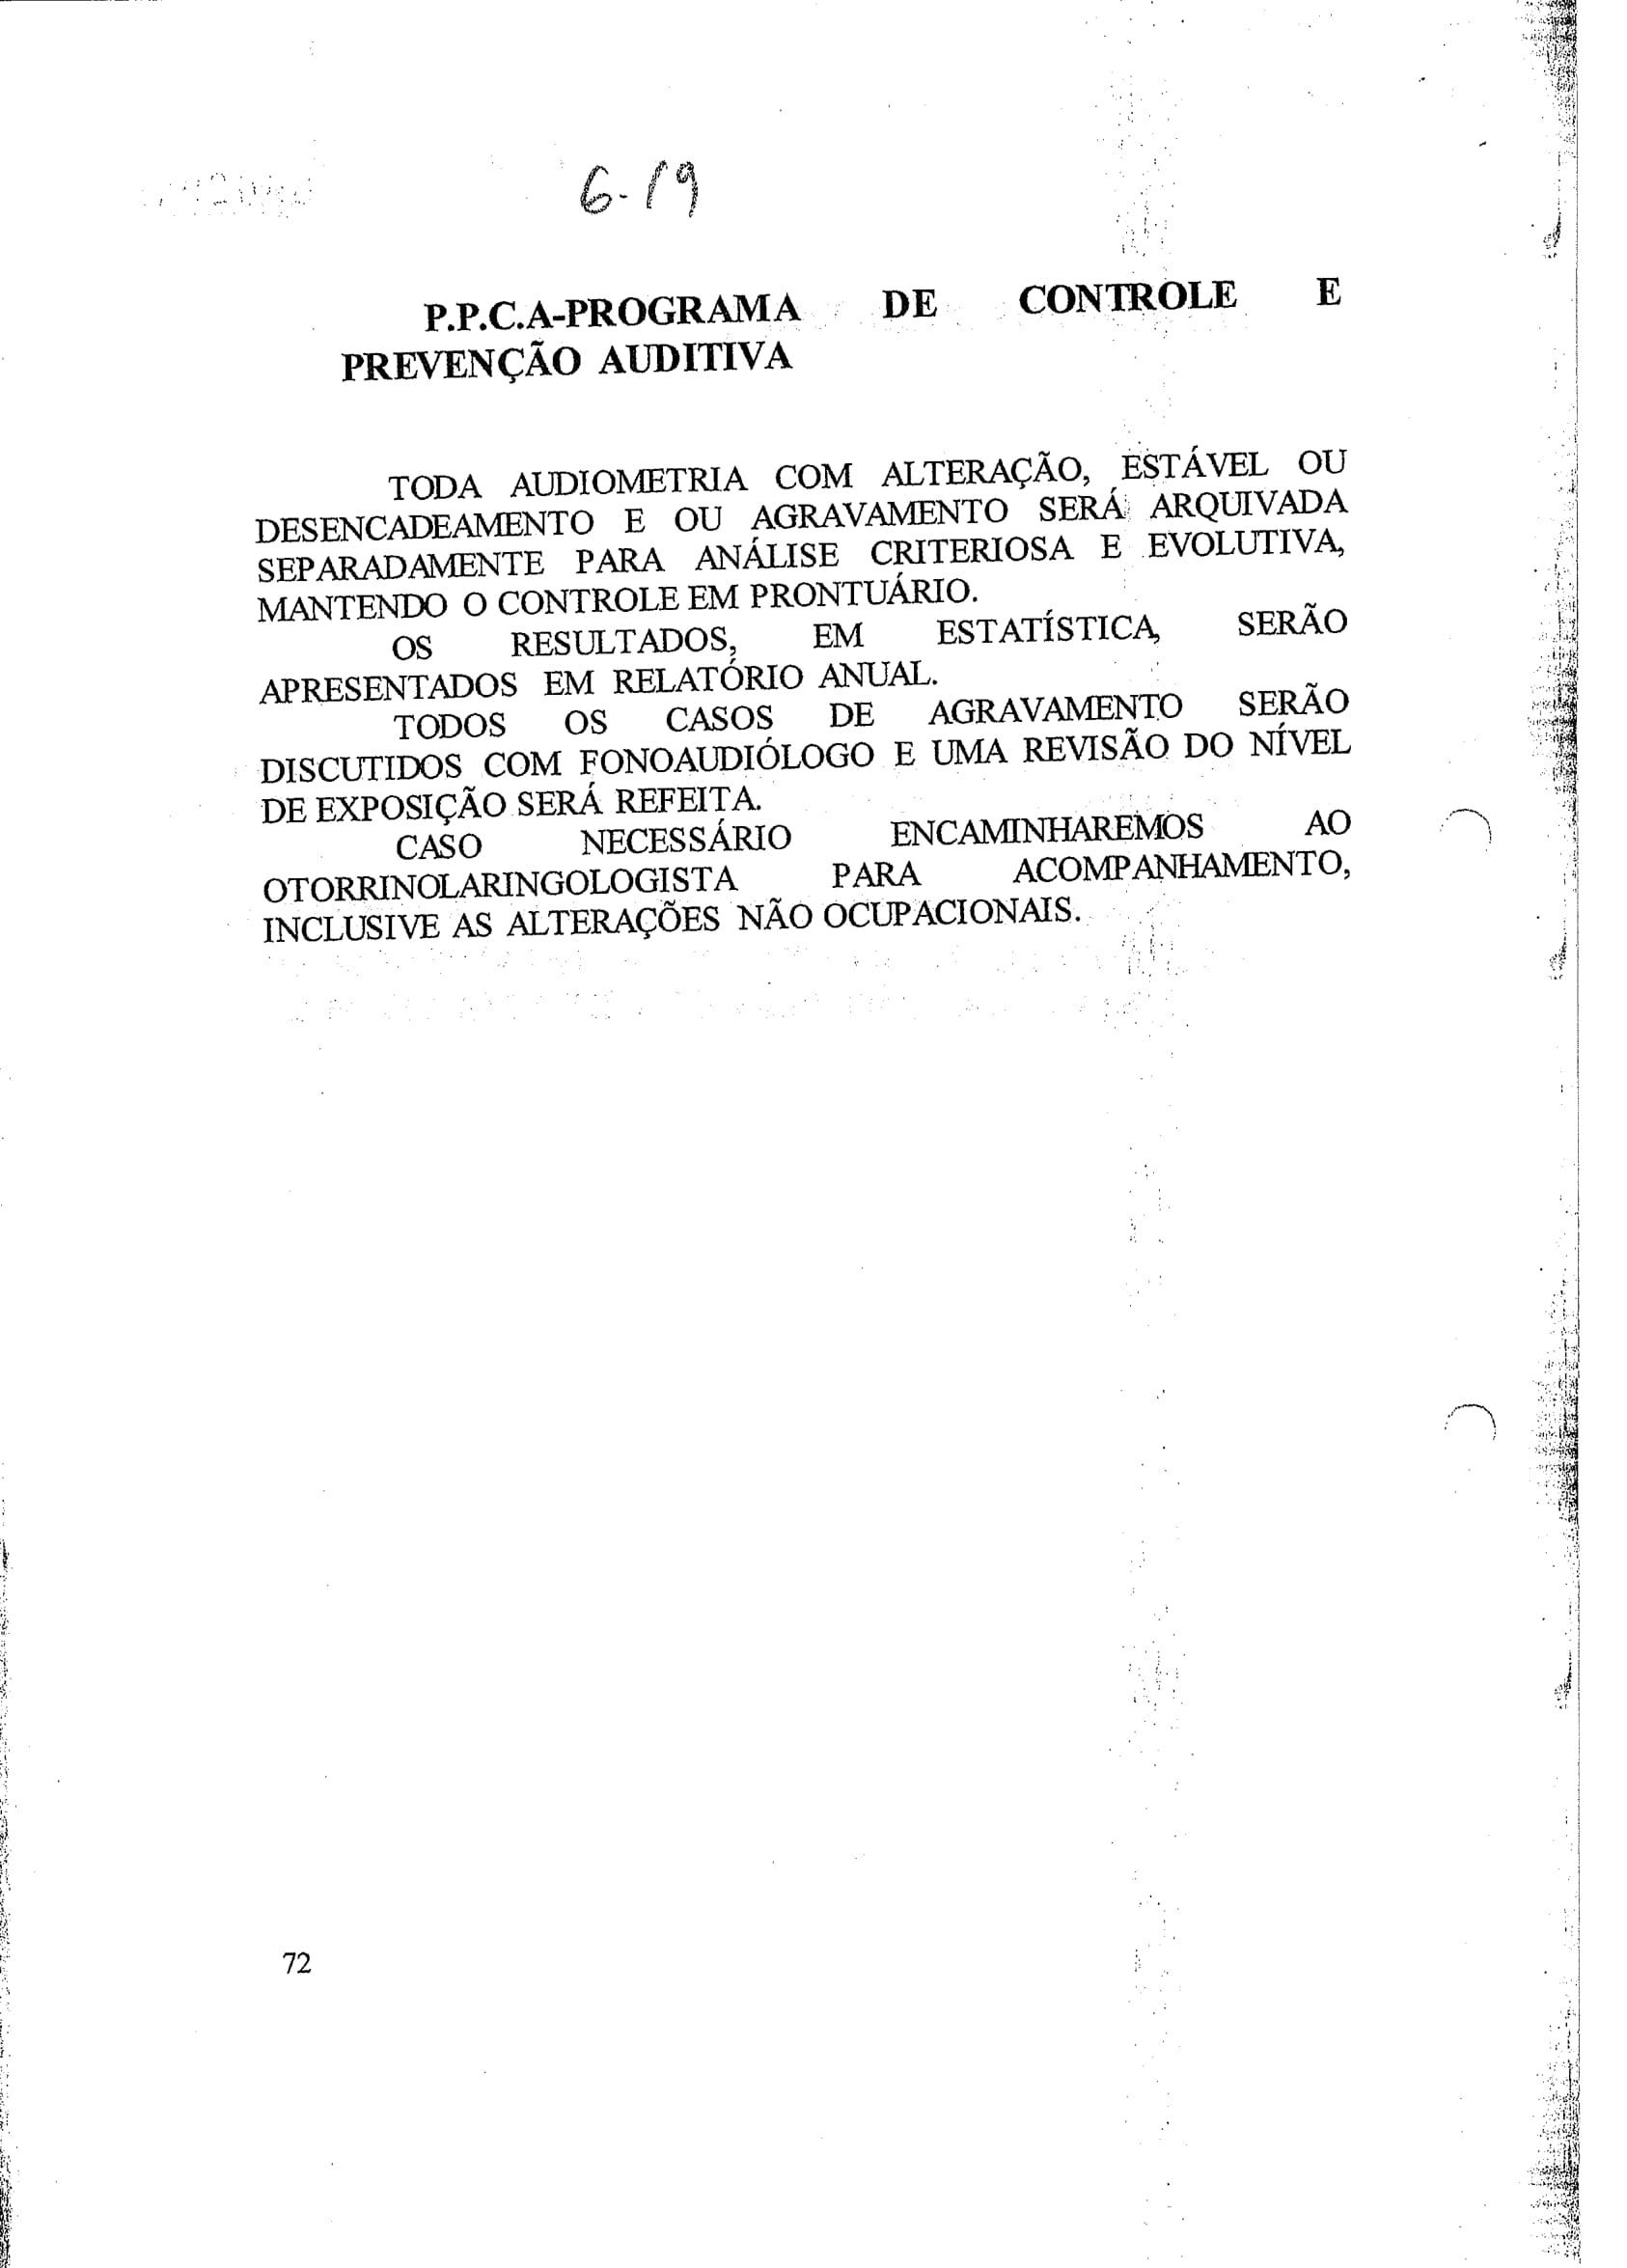 PL001222019-150